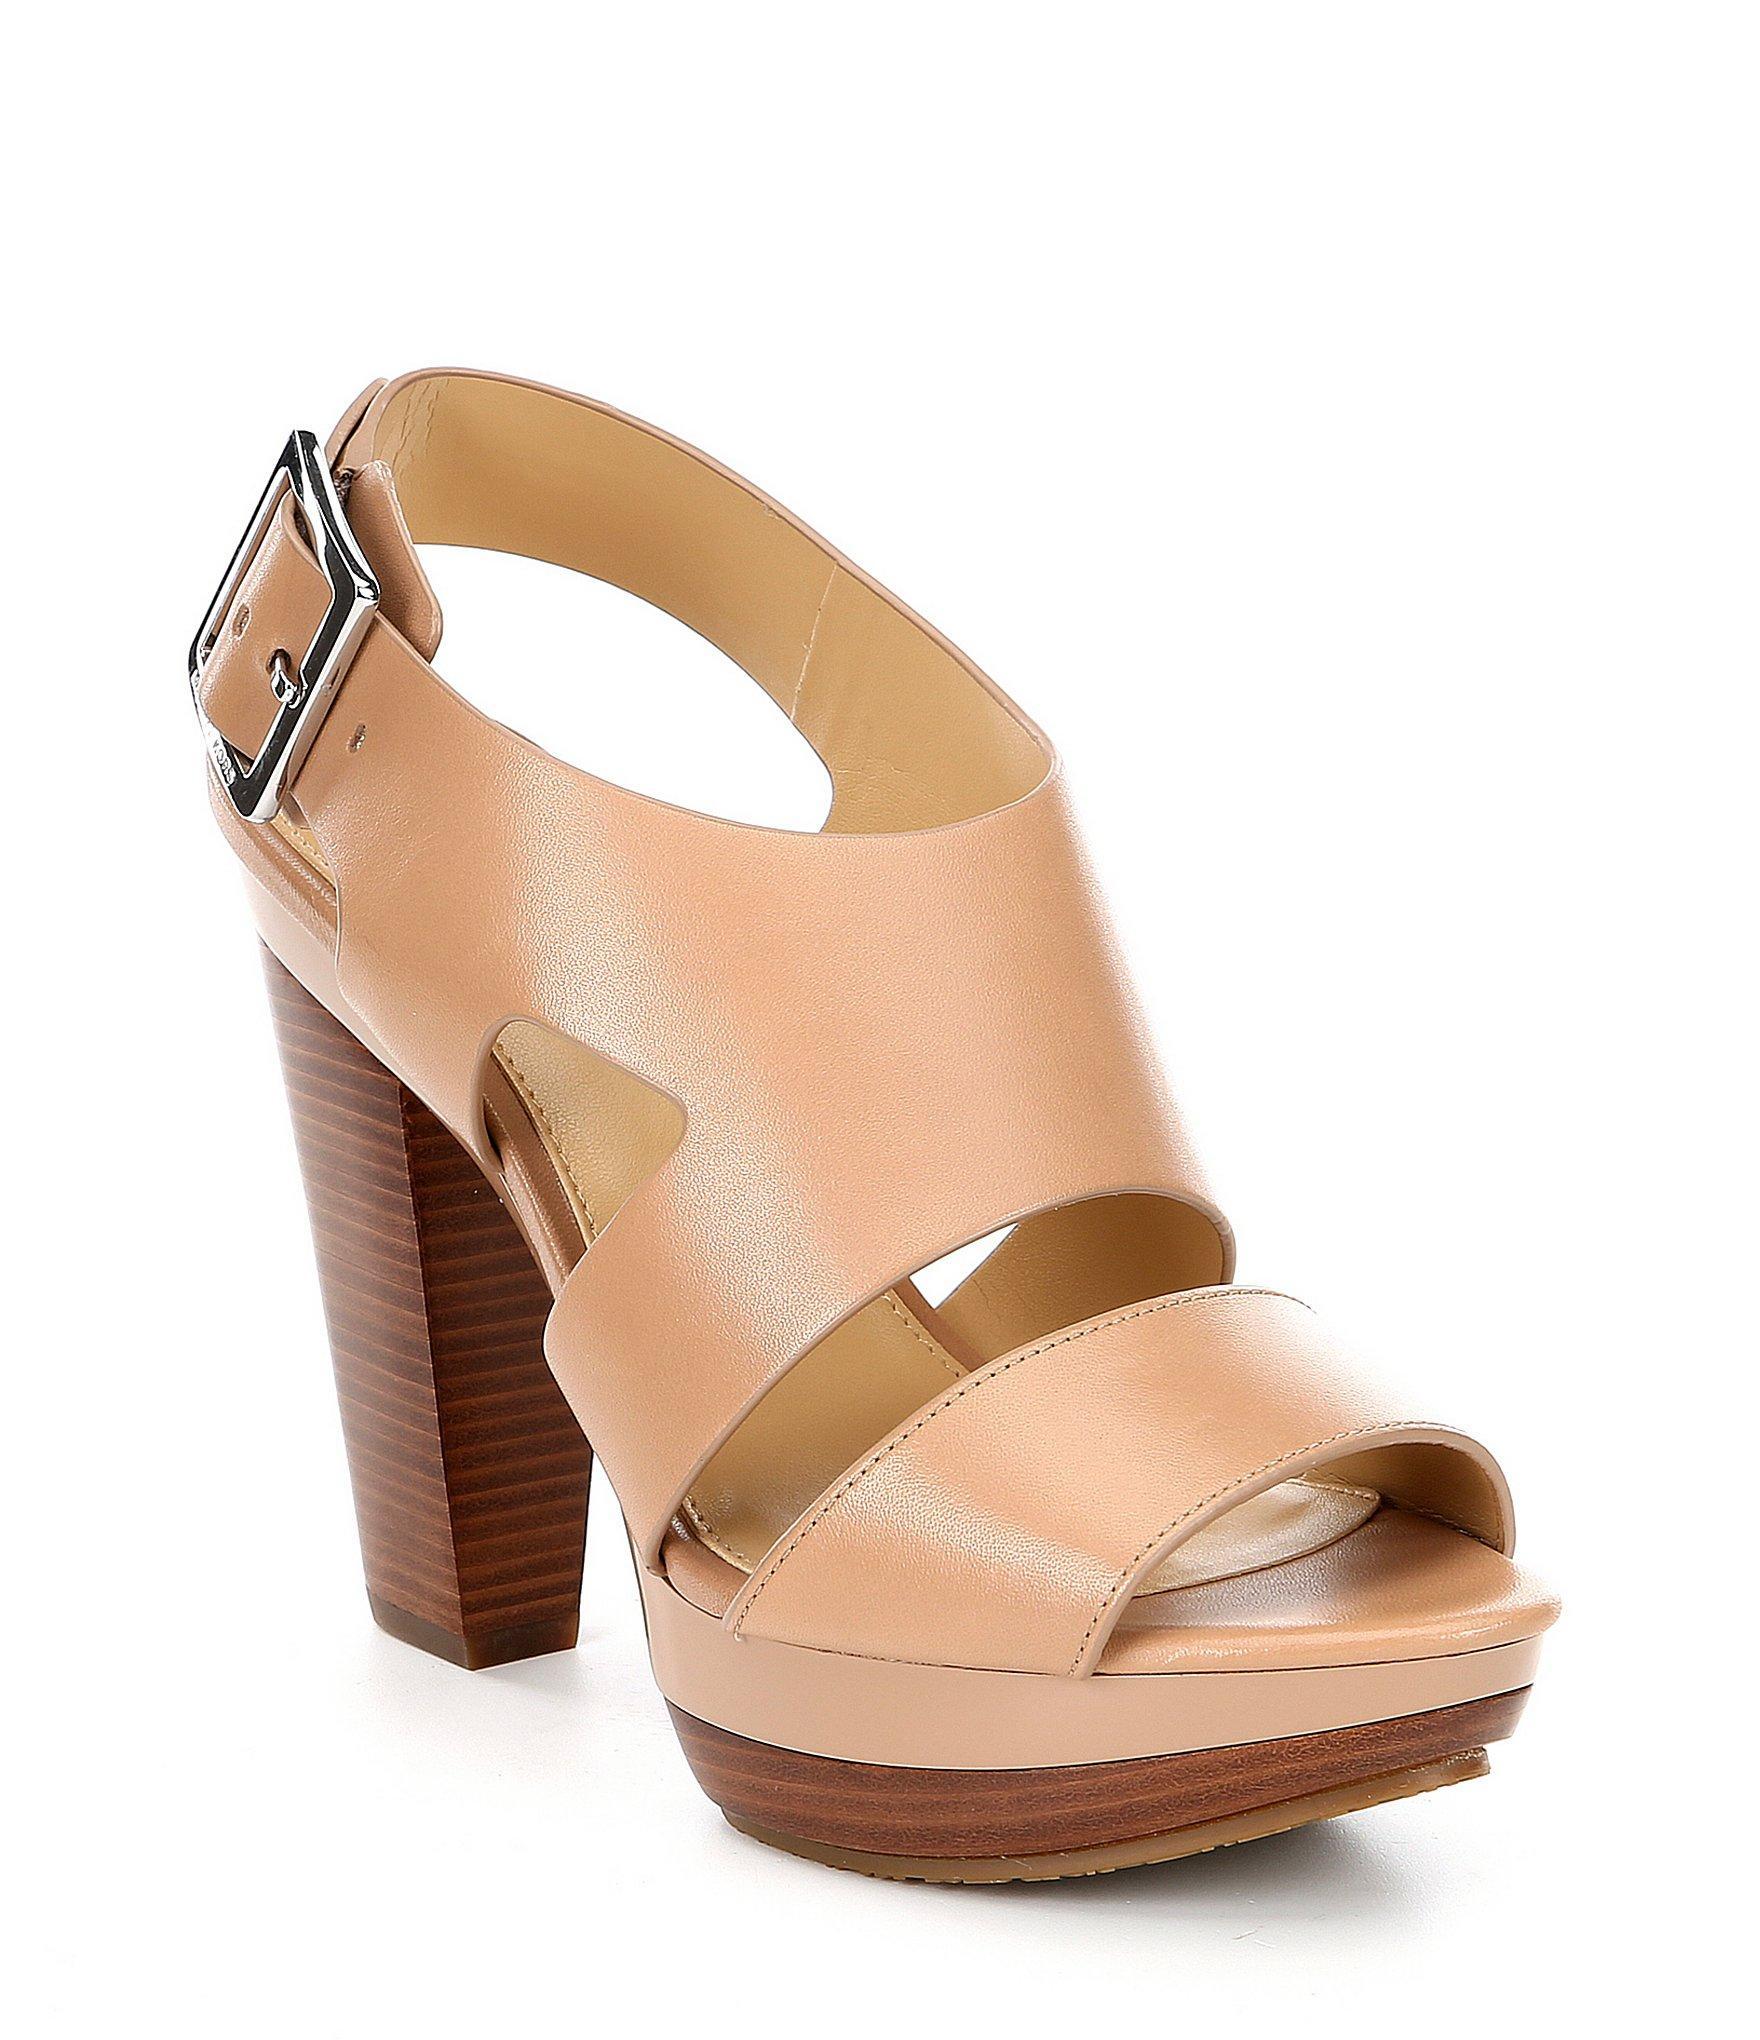 8e9d7a0839c MICHAEL Michael Kors. Women s Brown Carla Leather Platform Block Heel  Sandals